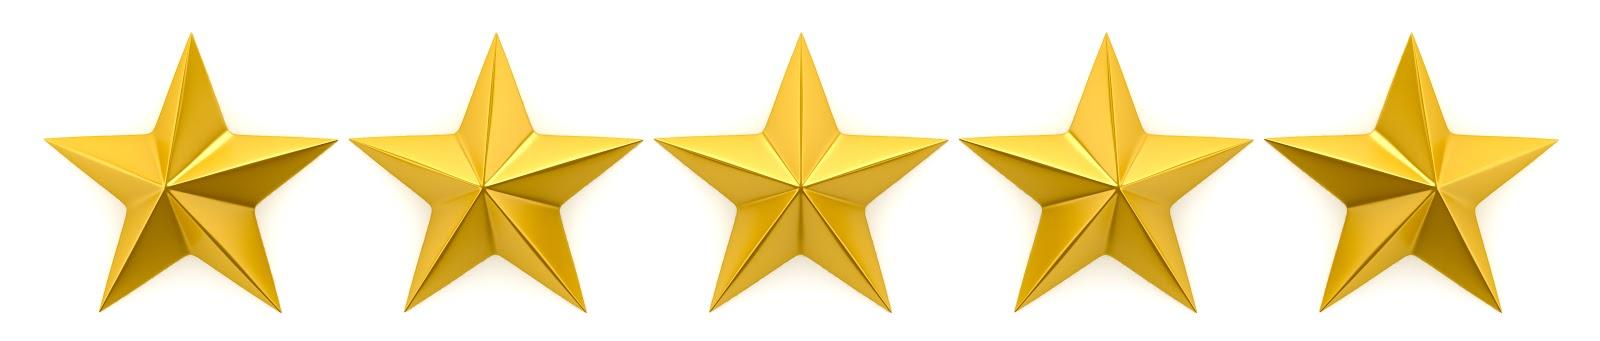 CenterRock - 5 Stars